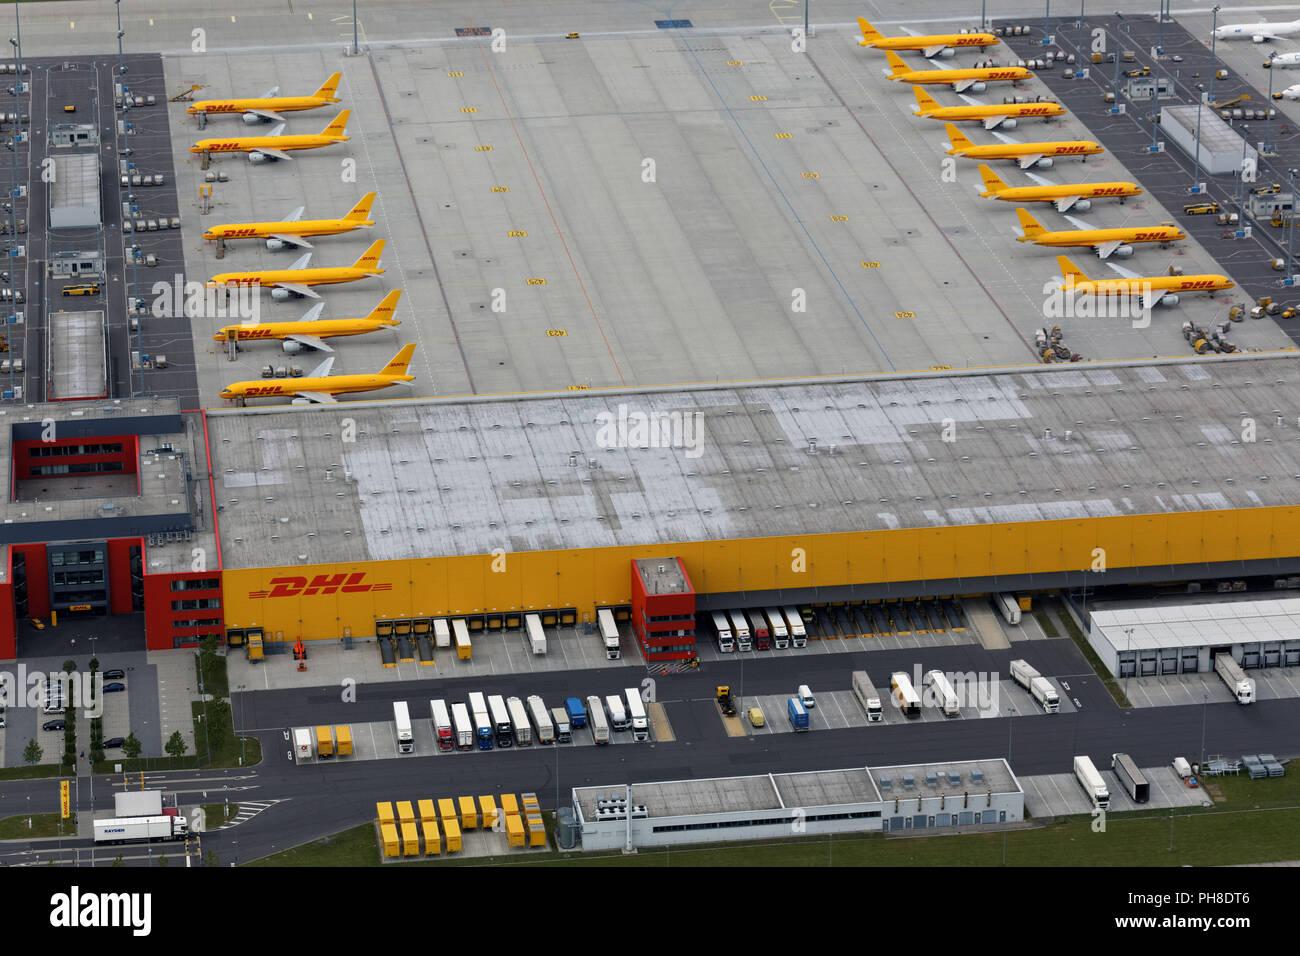 Dhl Hub Leipzig Gmbh Stock Photo 217160054 Alamy